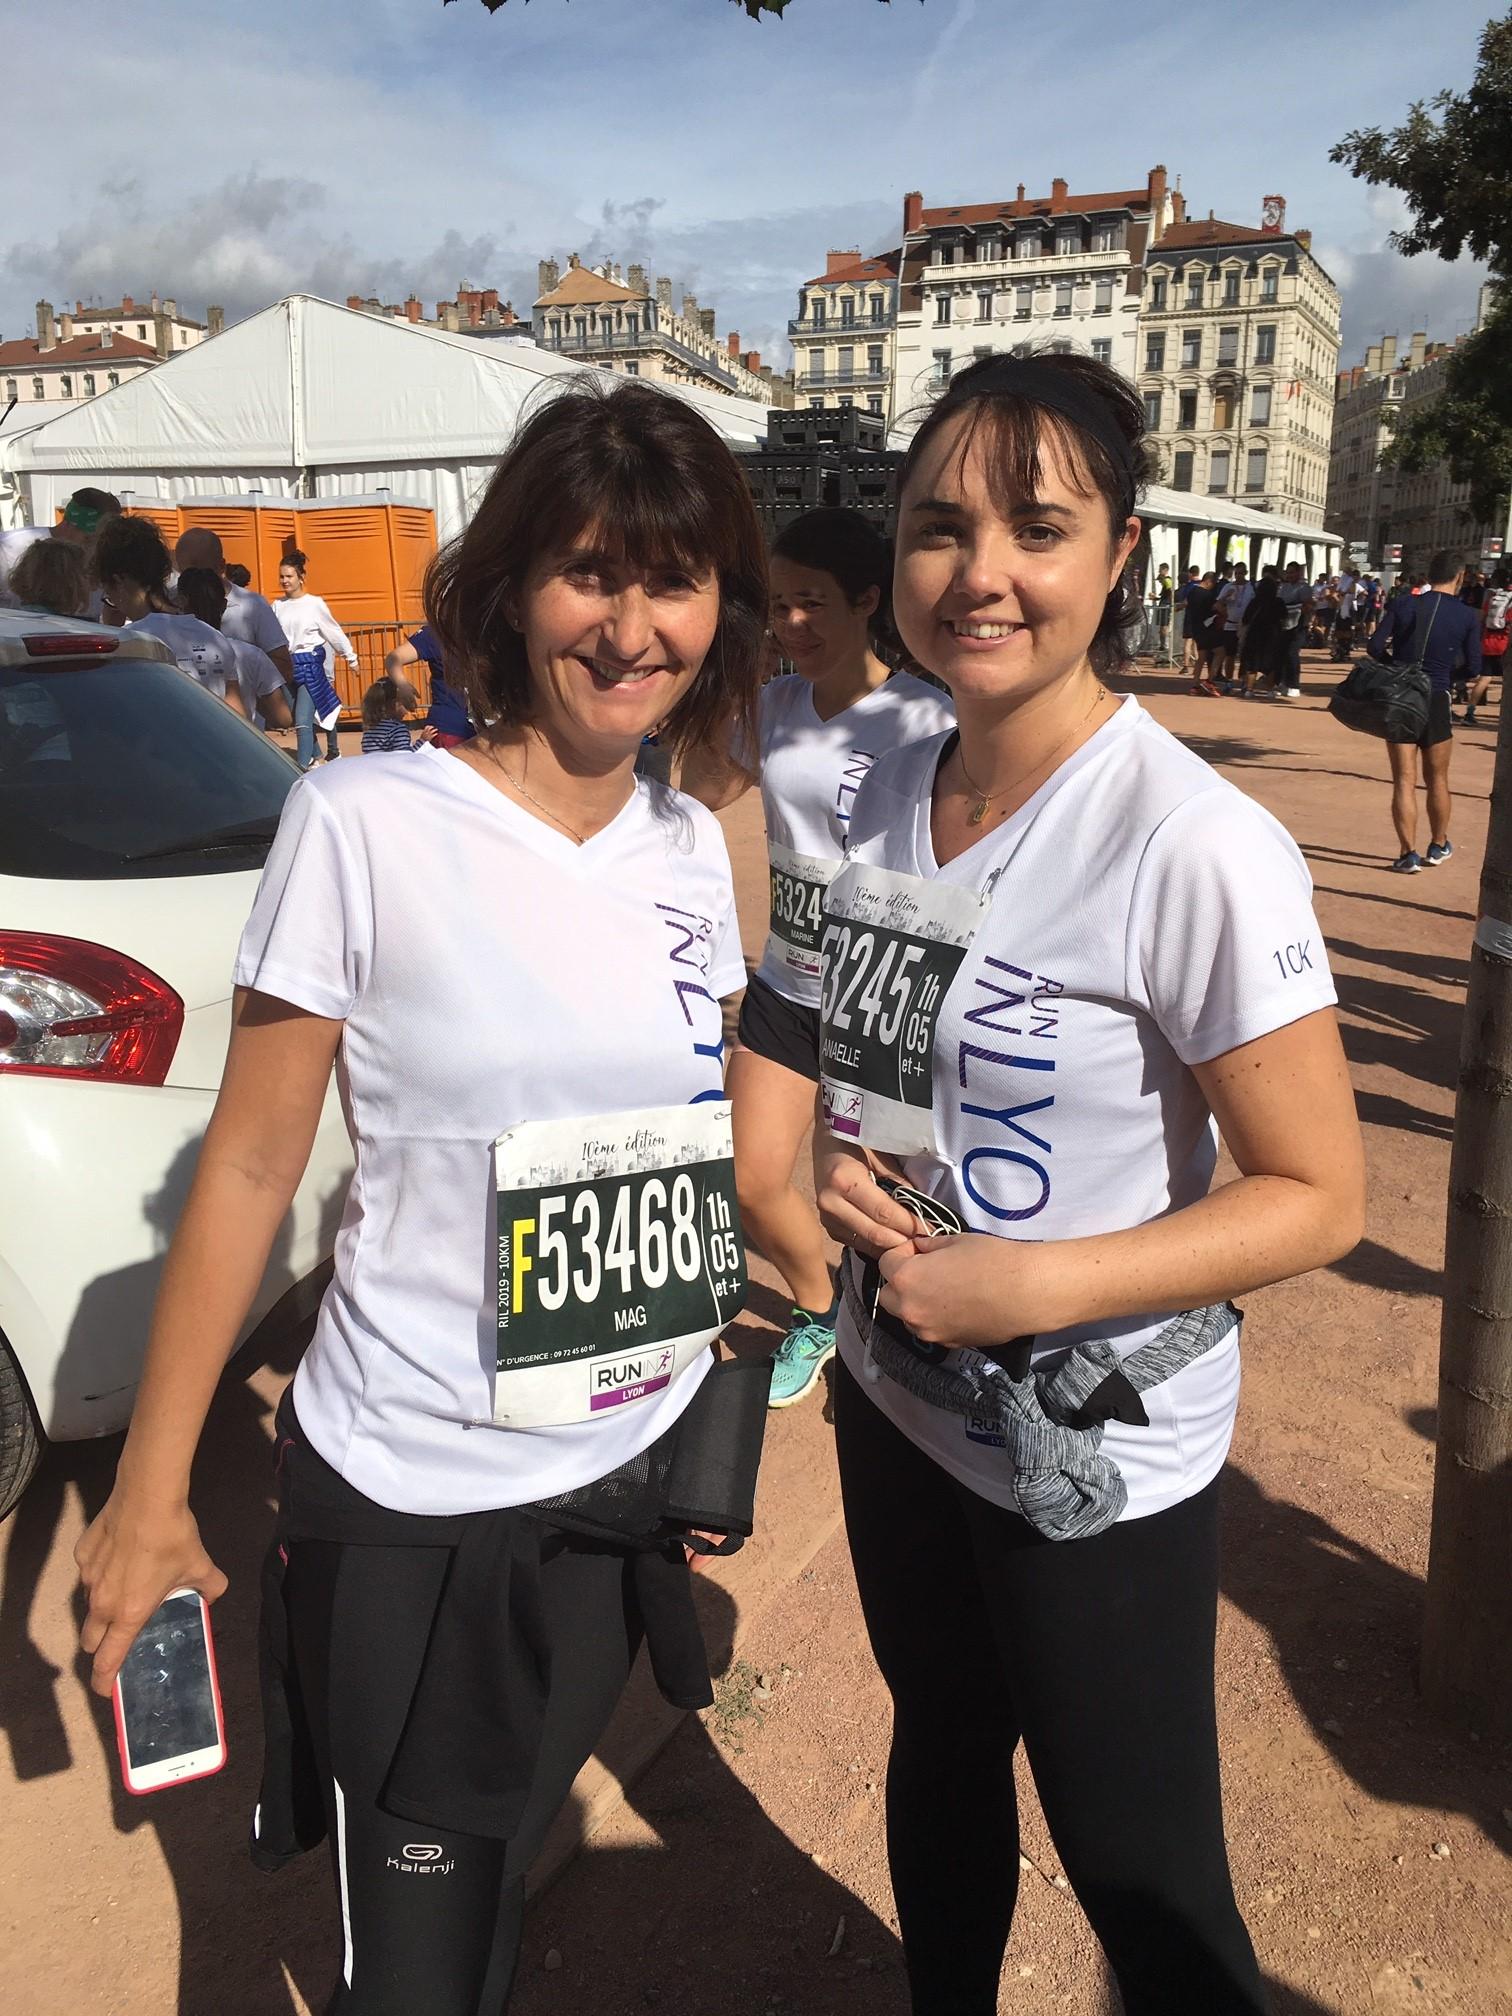 Run In Lyon : record battu : plus de 30 000 participants